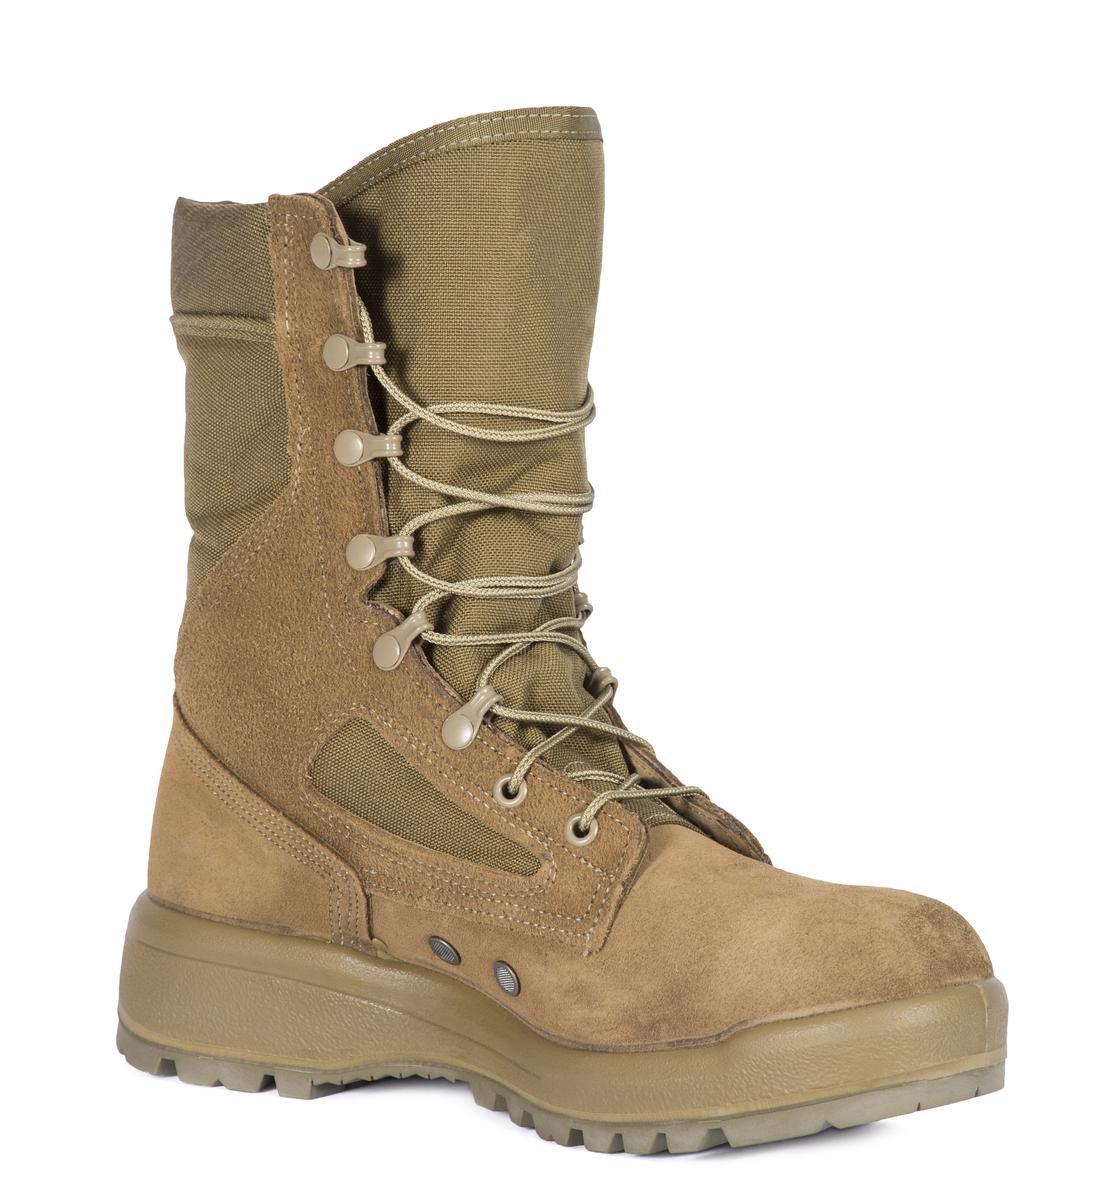 Belleville Men's USMC Hot Weather Combat Green Olive Leather Boots 11.5R